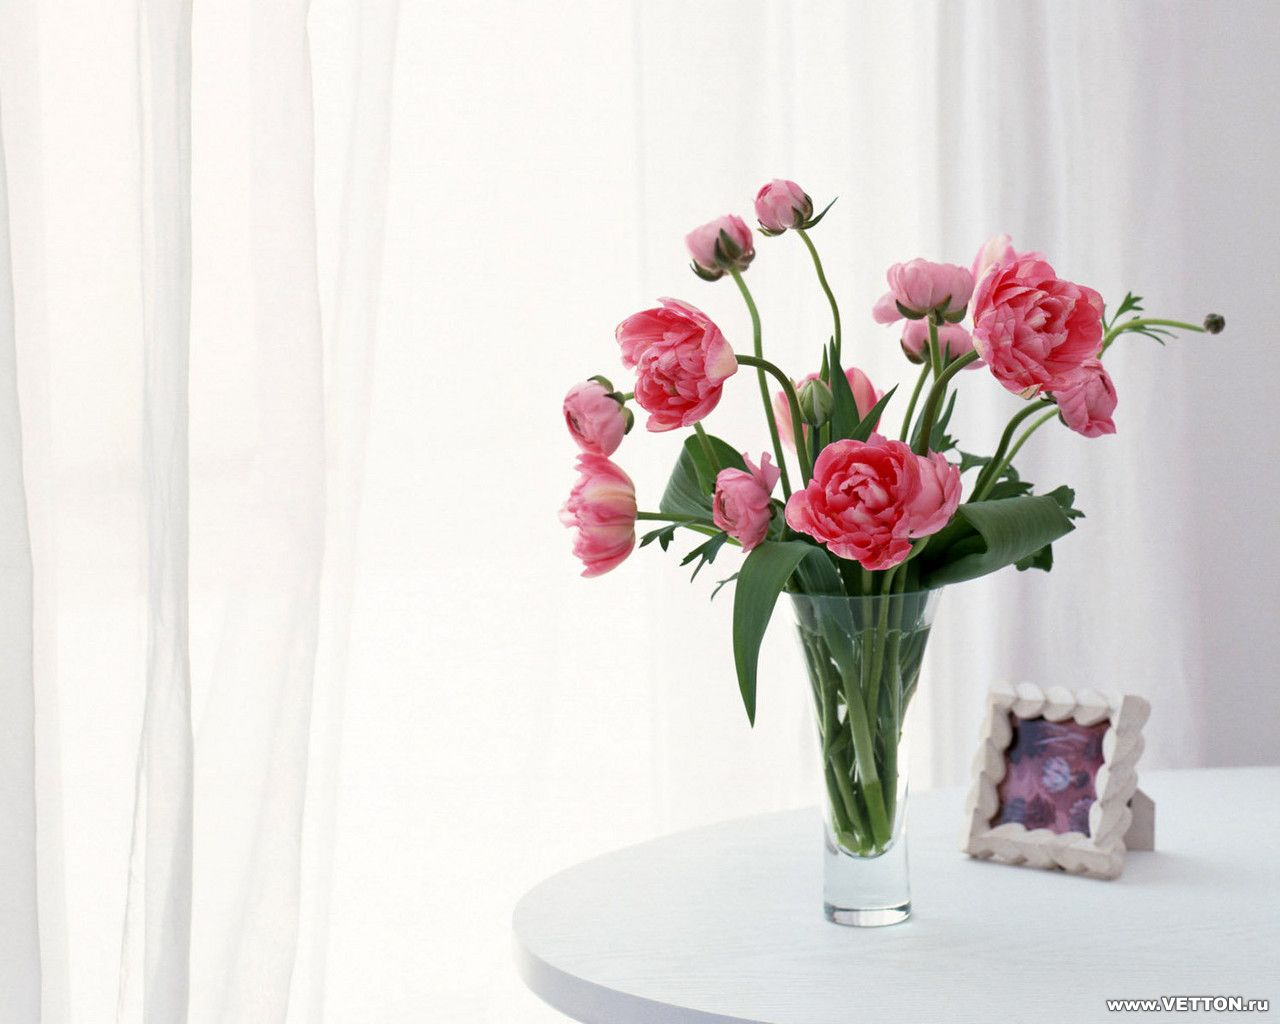 Цветы в вазе фото картинки